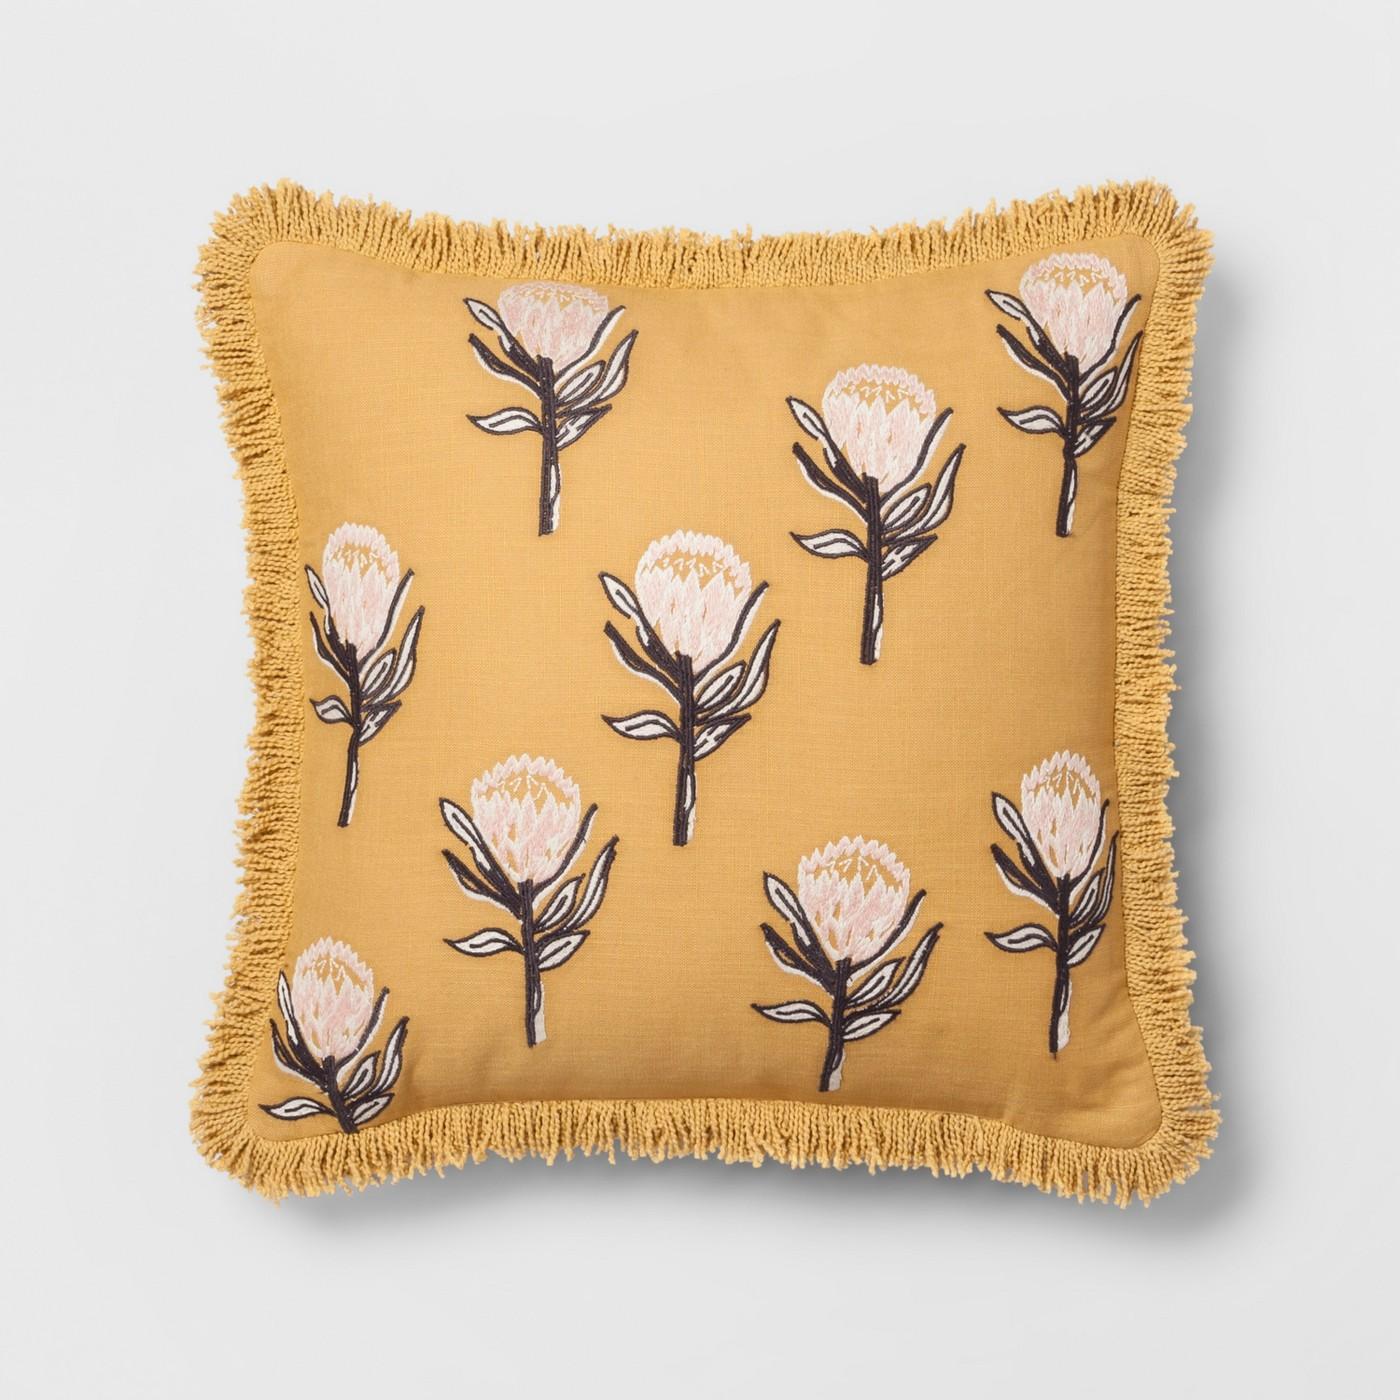 Pillow $19